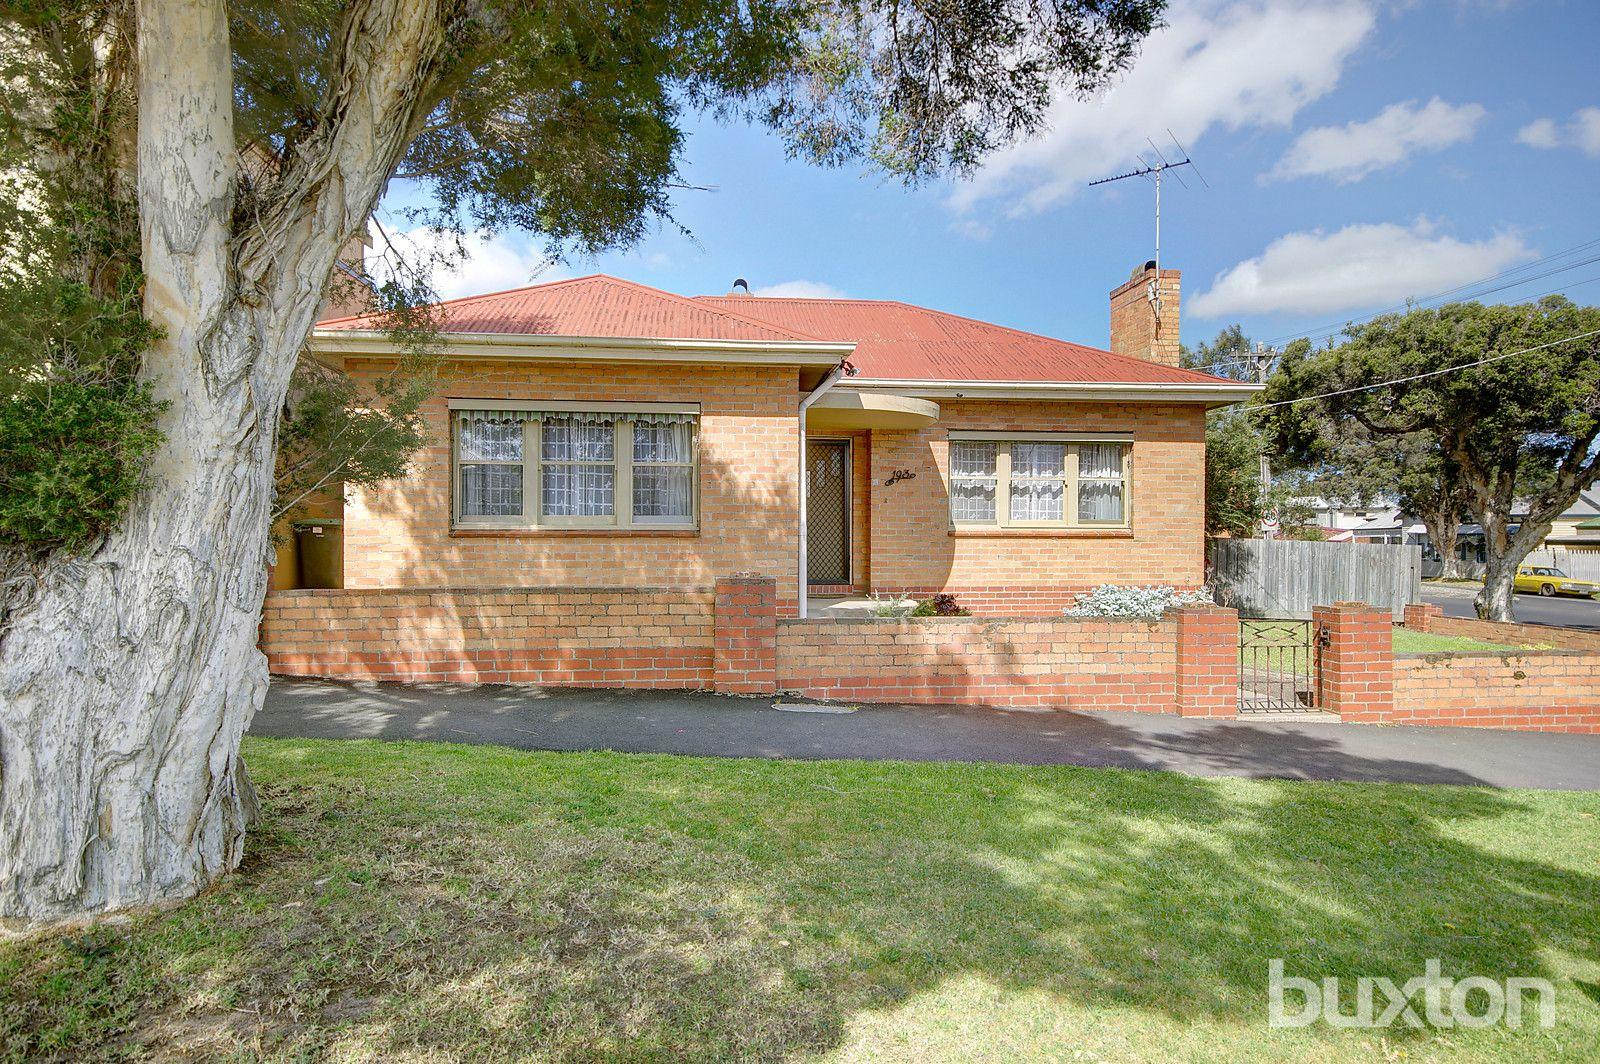 193 Yarra Street, Geelong VIC 3220, Image 0